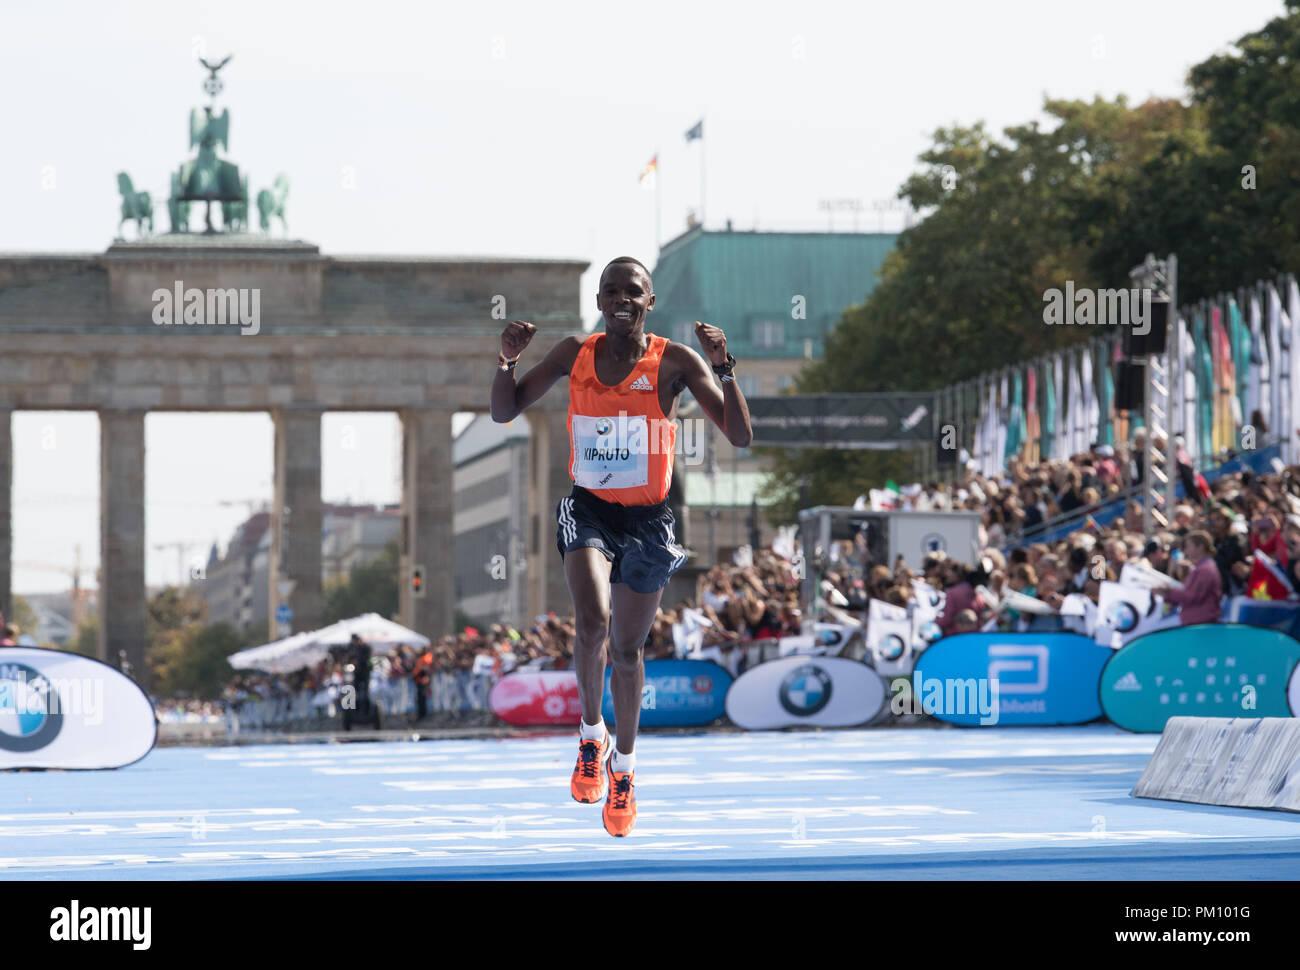 Berlin, Germany. 16 September 2018, Berlin: Amos Kipruto finishing second the 45th BMW Berlin Marathon. Photo: Soeren Stache/dpa Credit: dpa picture alliance/Alamy Live News - Stock Image